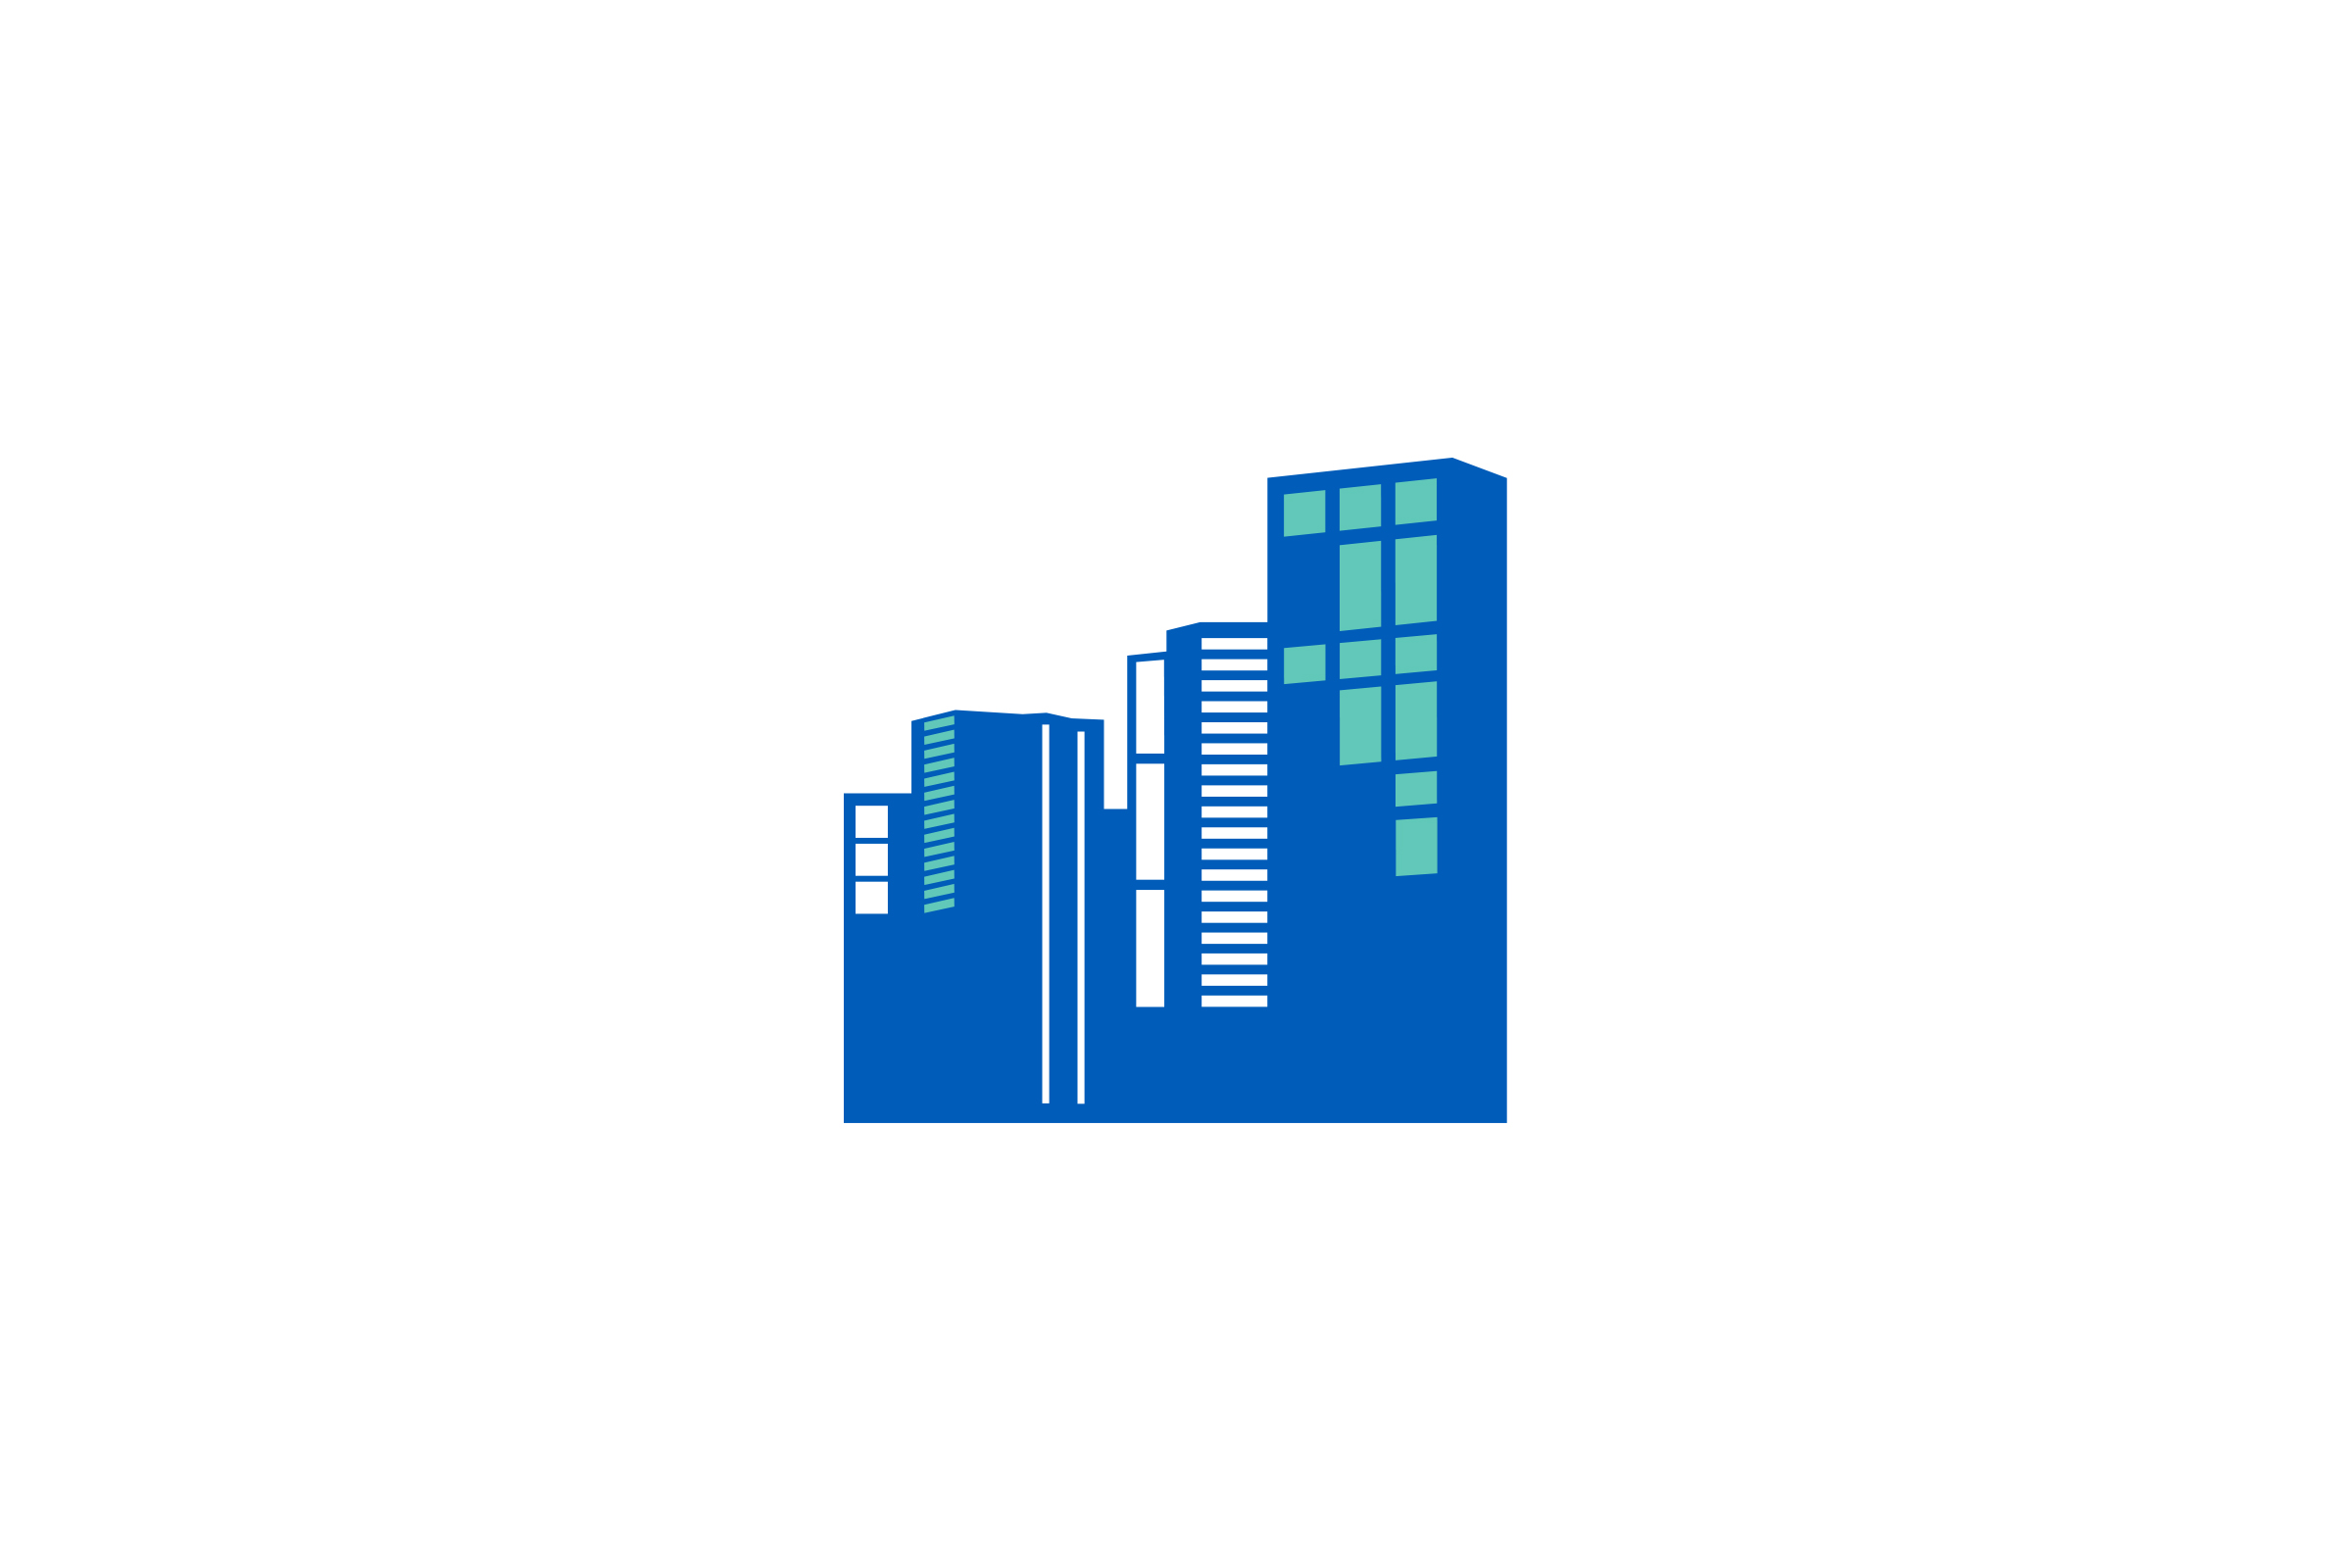 hearthfire-creative-logo-brand-identity-designer-denver-colorado-8020-builders-6.jpg